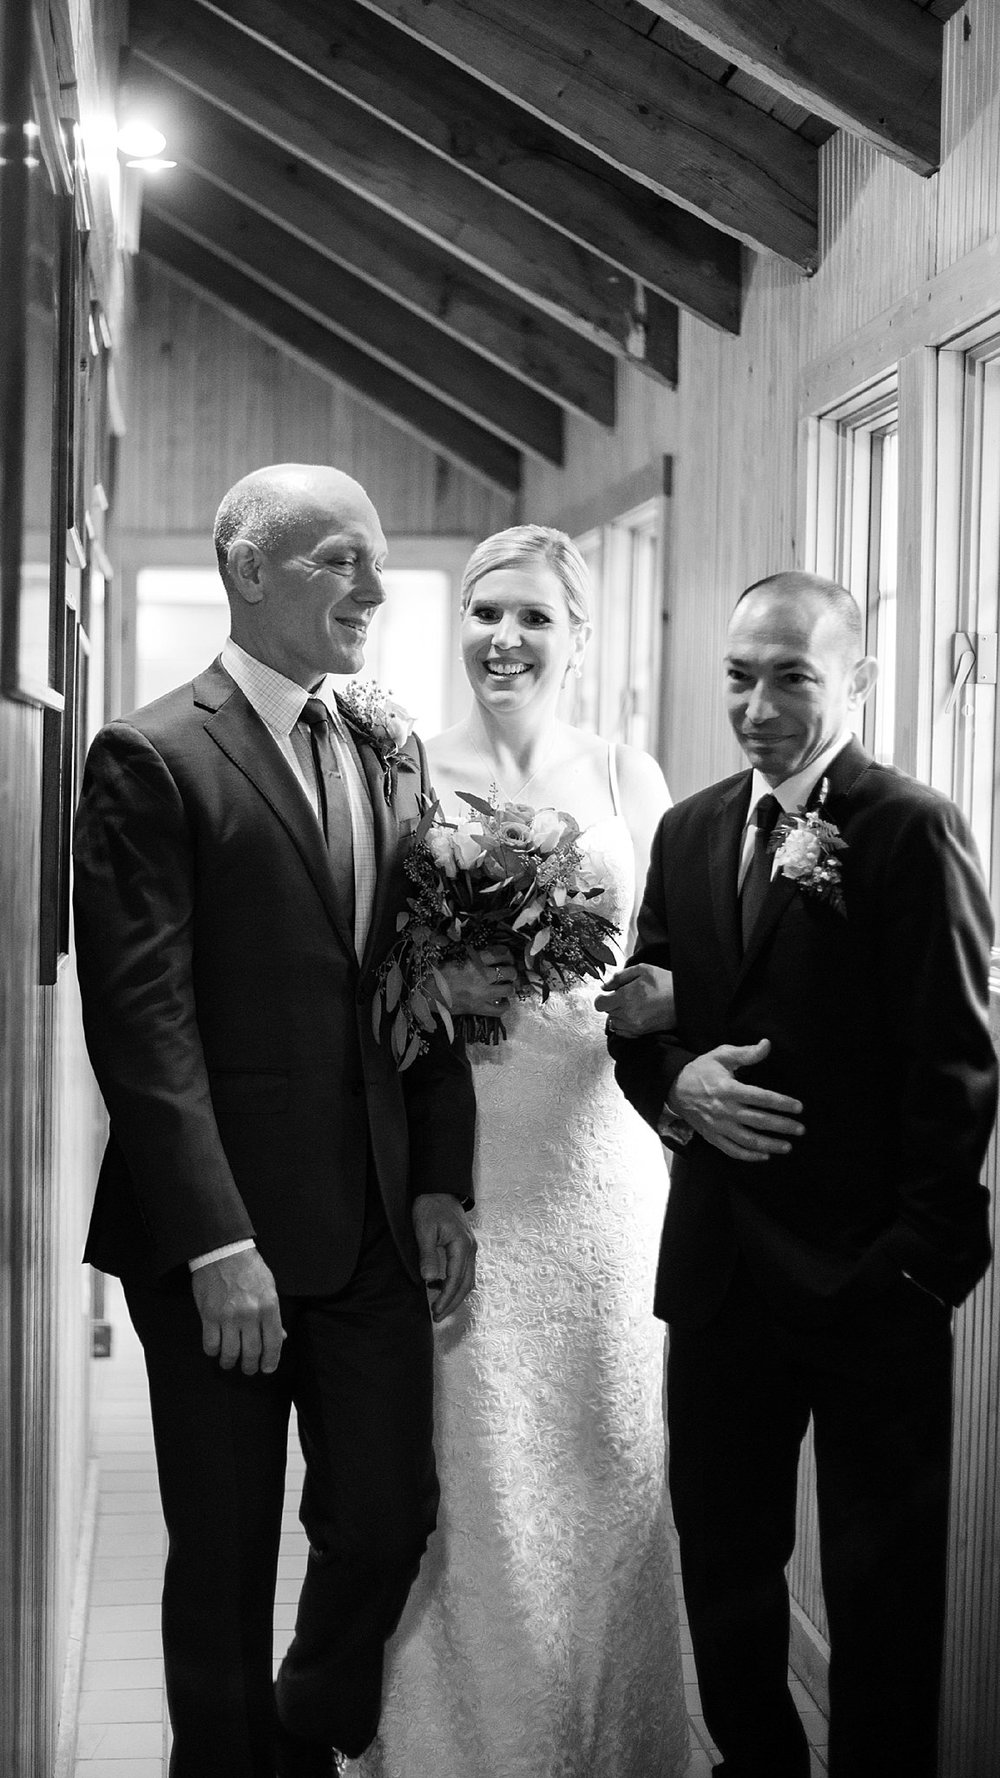 Bride Waits to Walk Down the Aisle - Virginia Wedding